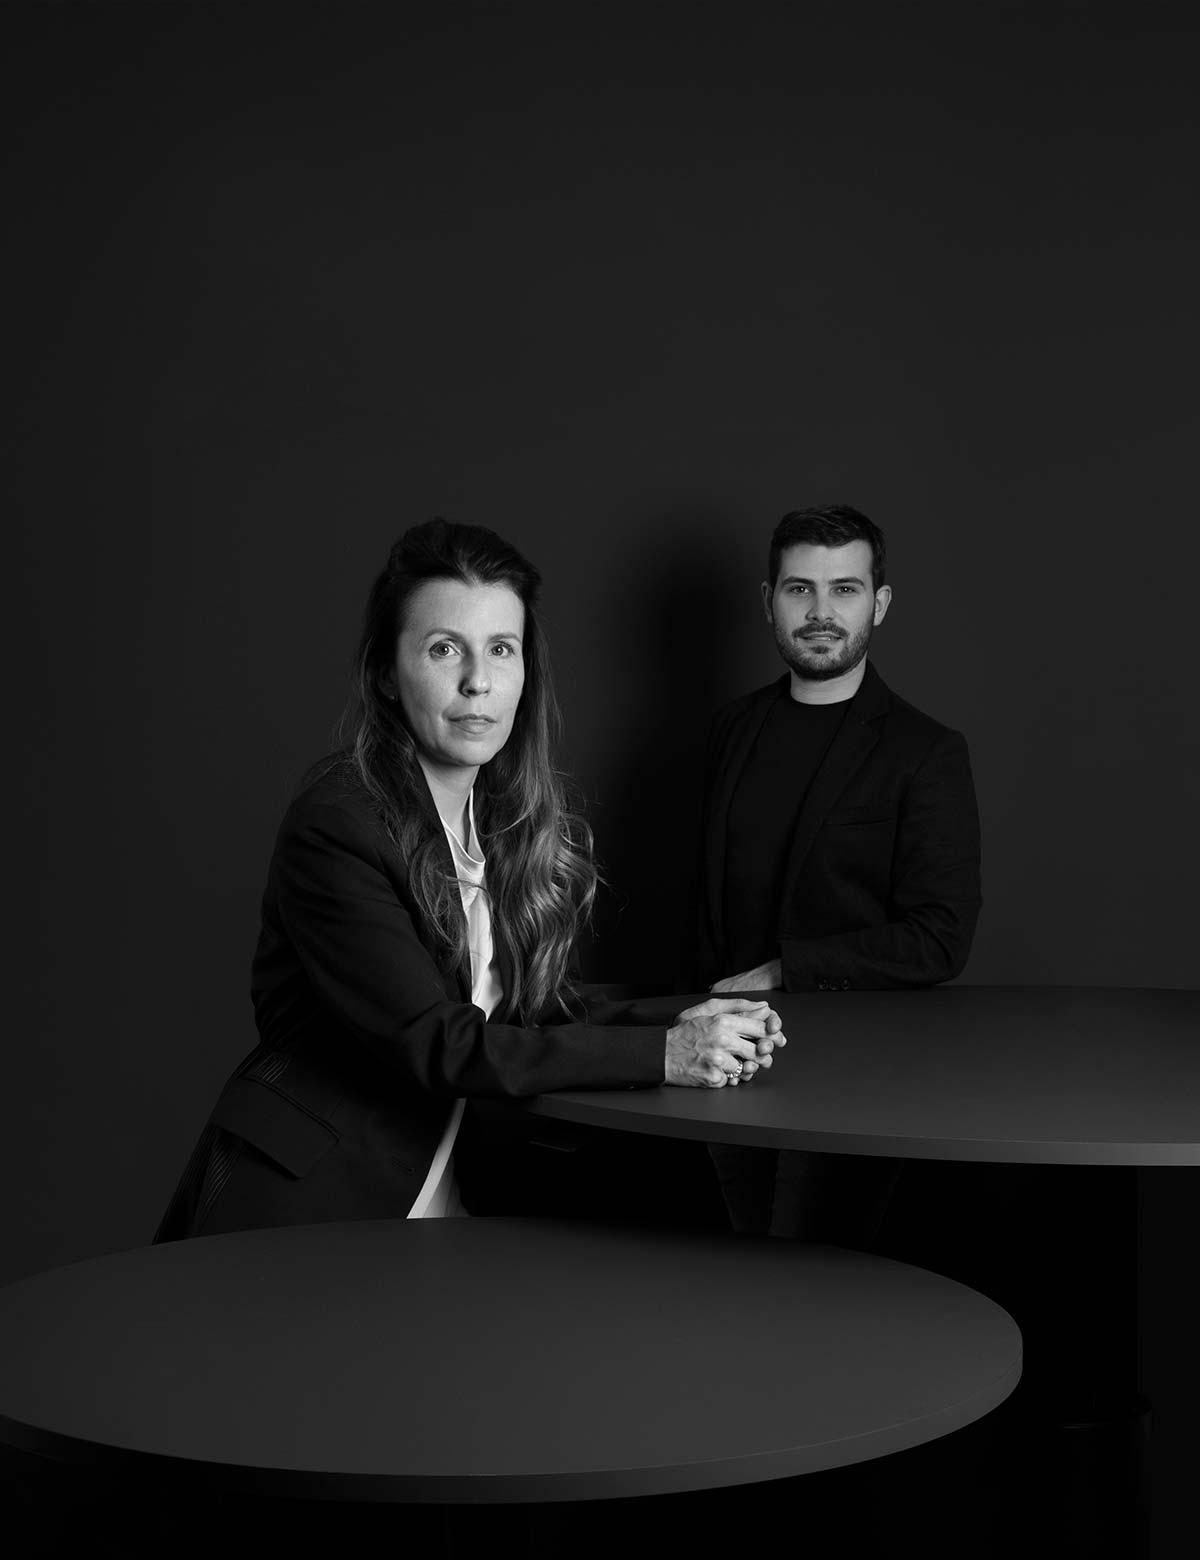 Laura Marchina & Matteo Salvi